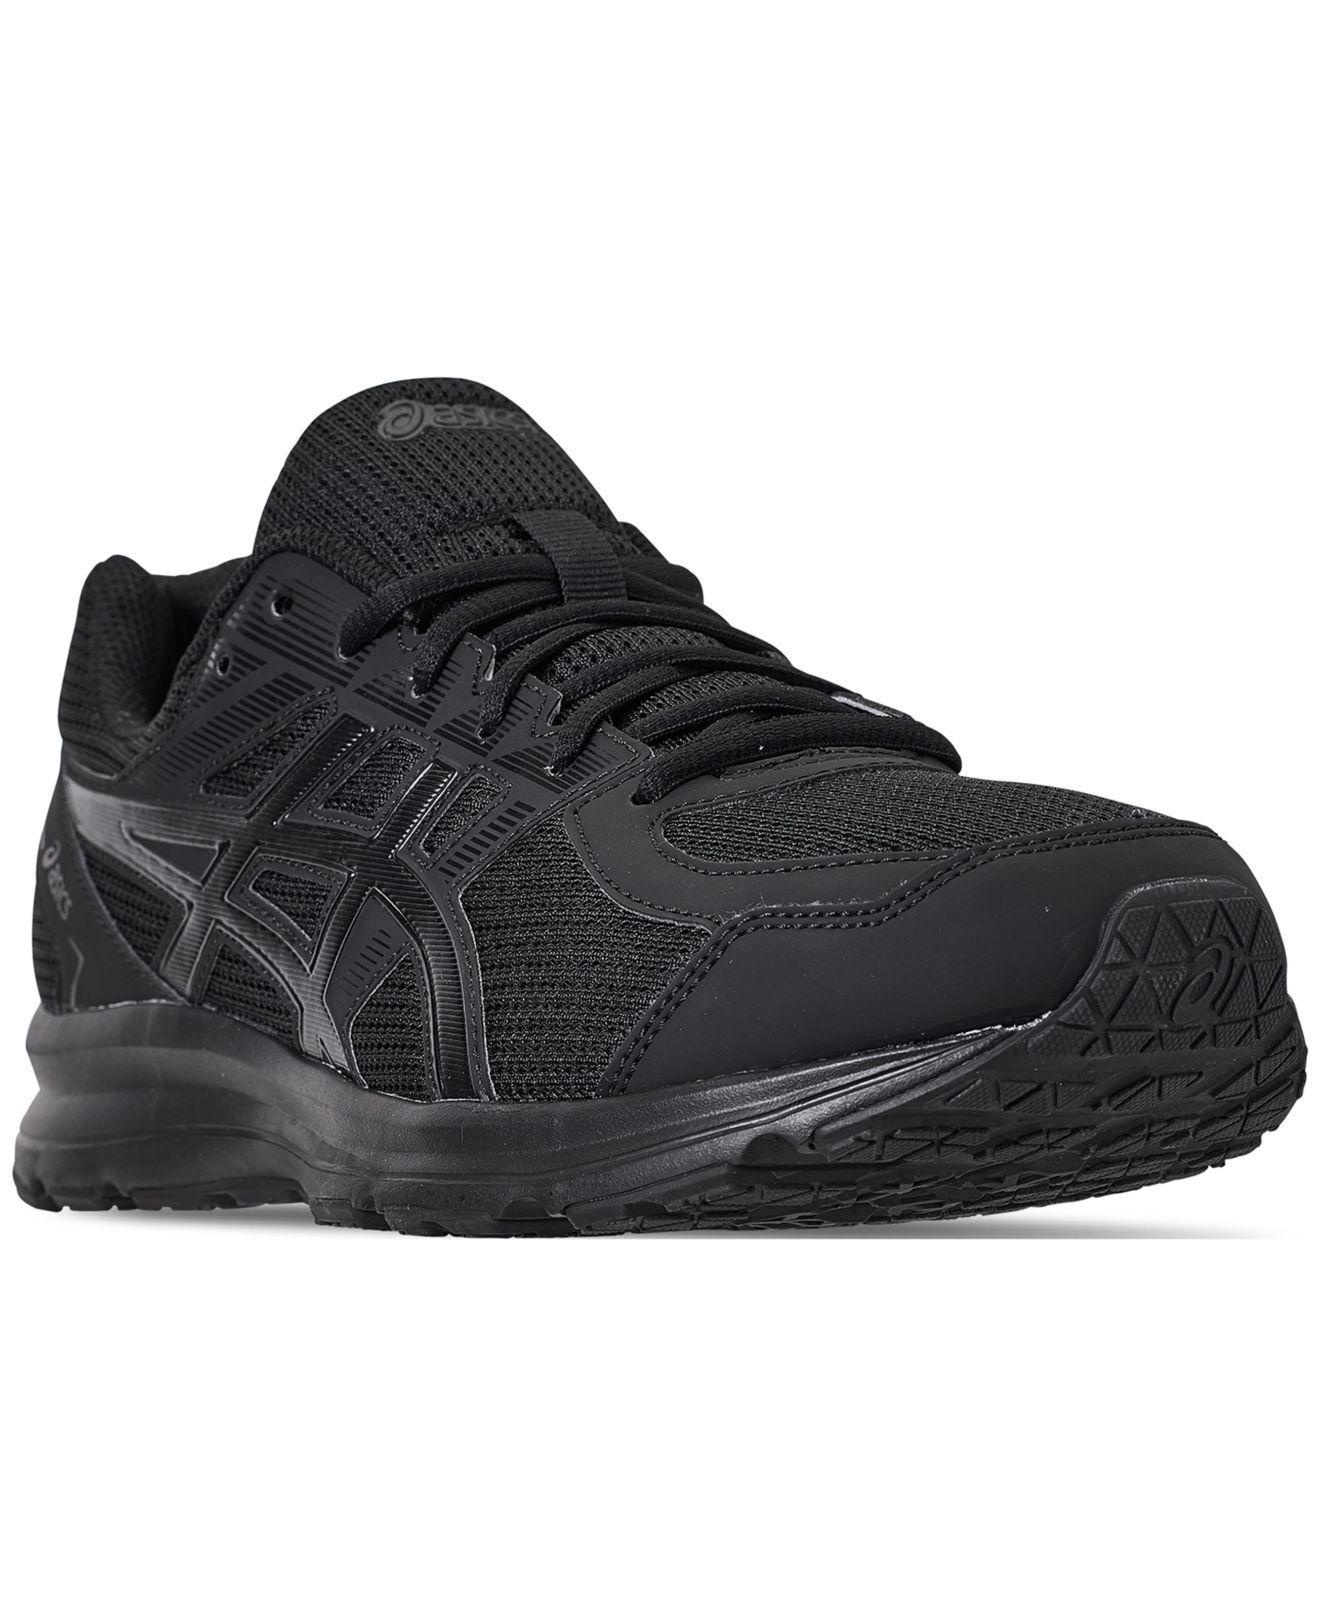 5c3b6bc30709 Lyst - Asics Men s Jolt Running Sneakers From Finish Line in Black ...